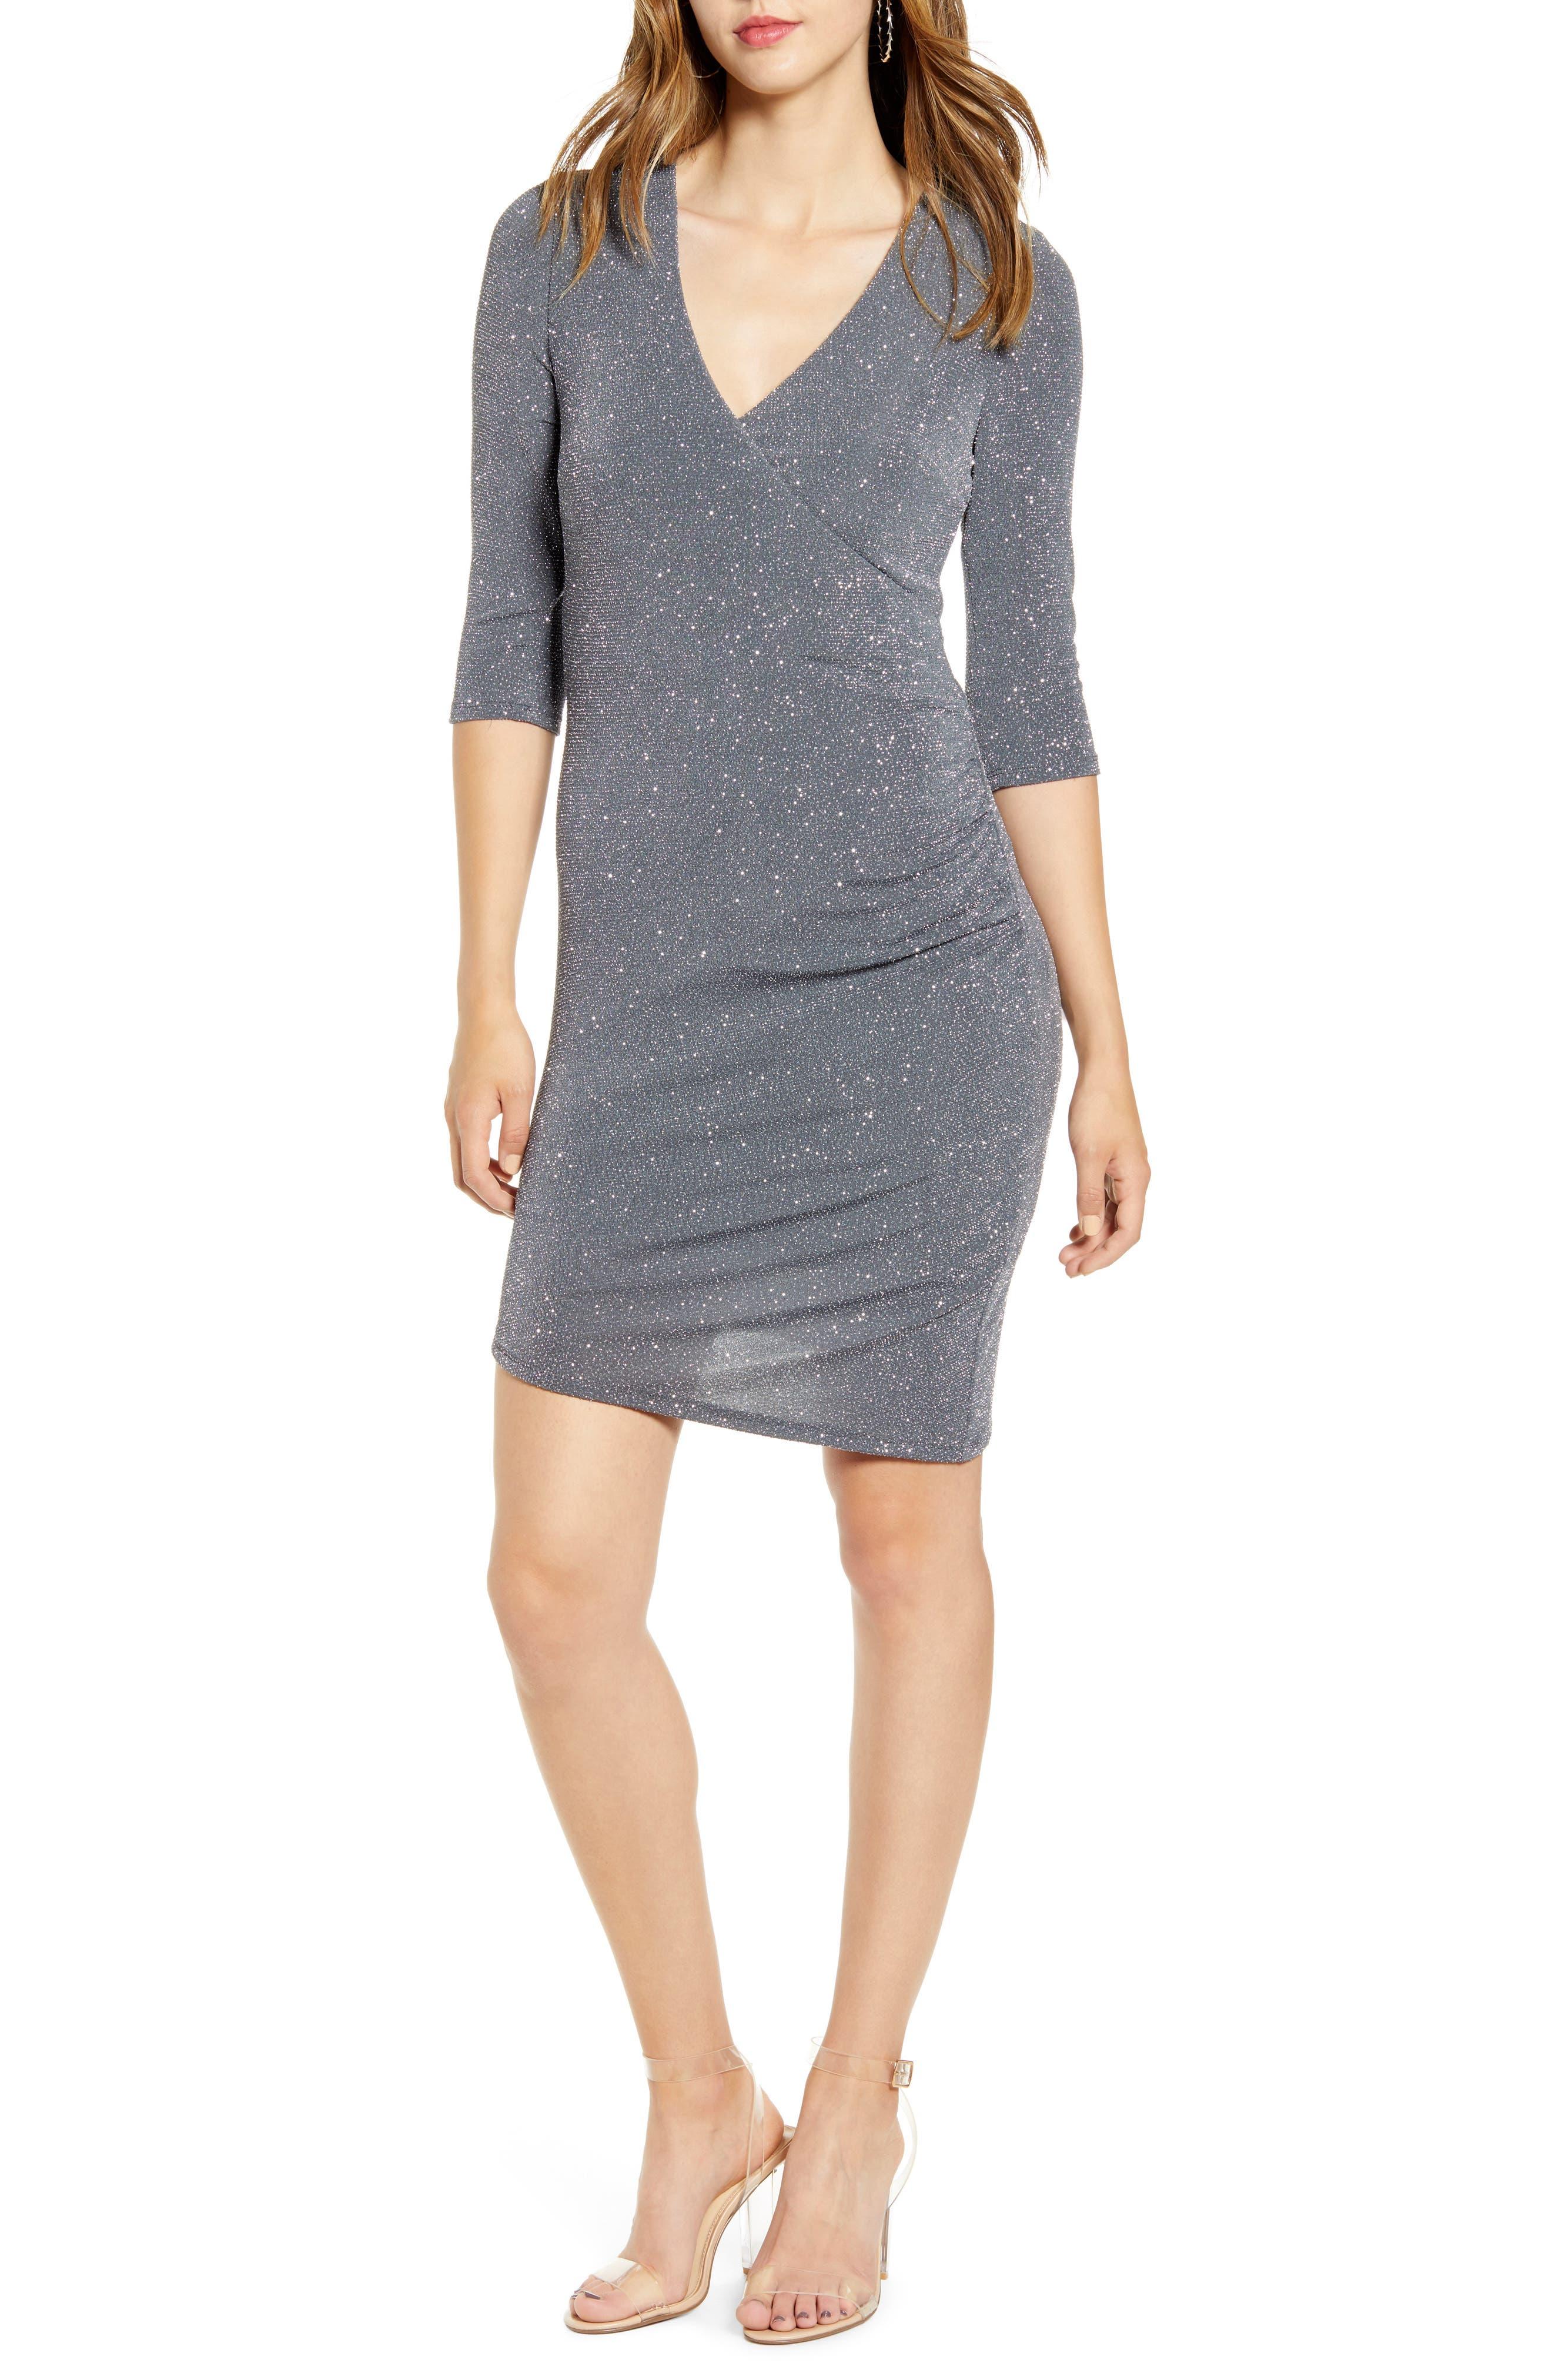 Speechless Glitter Wrap Style Sheath Dress, Metallic